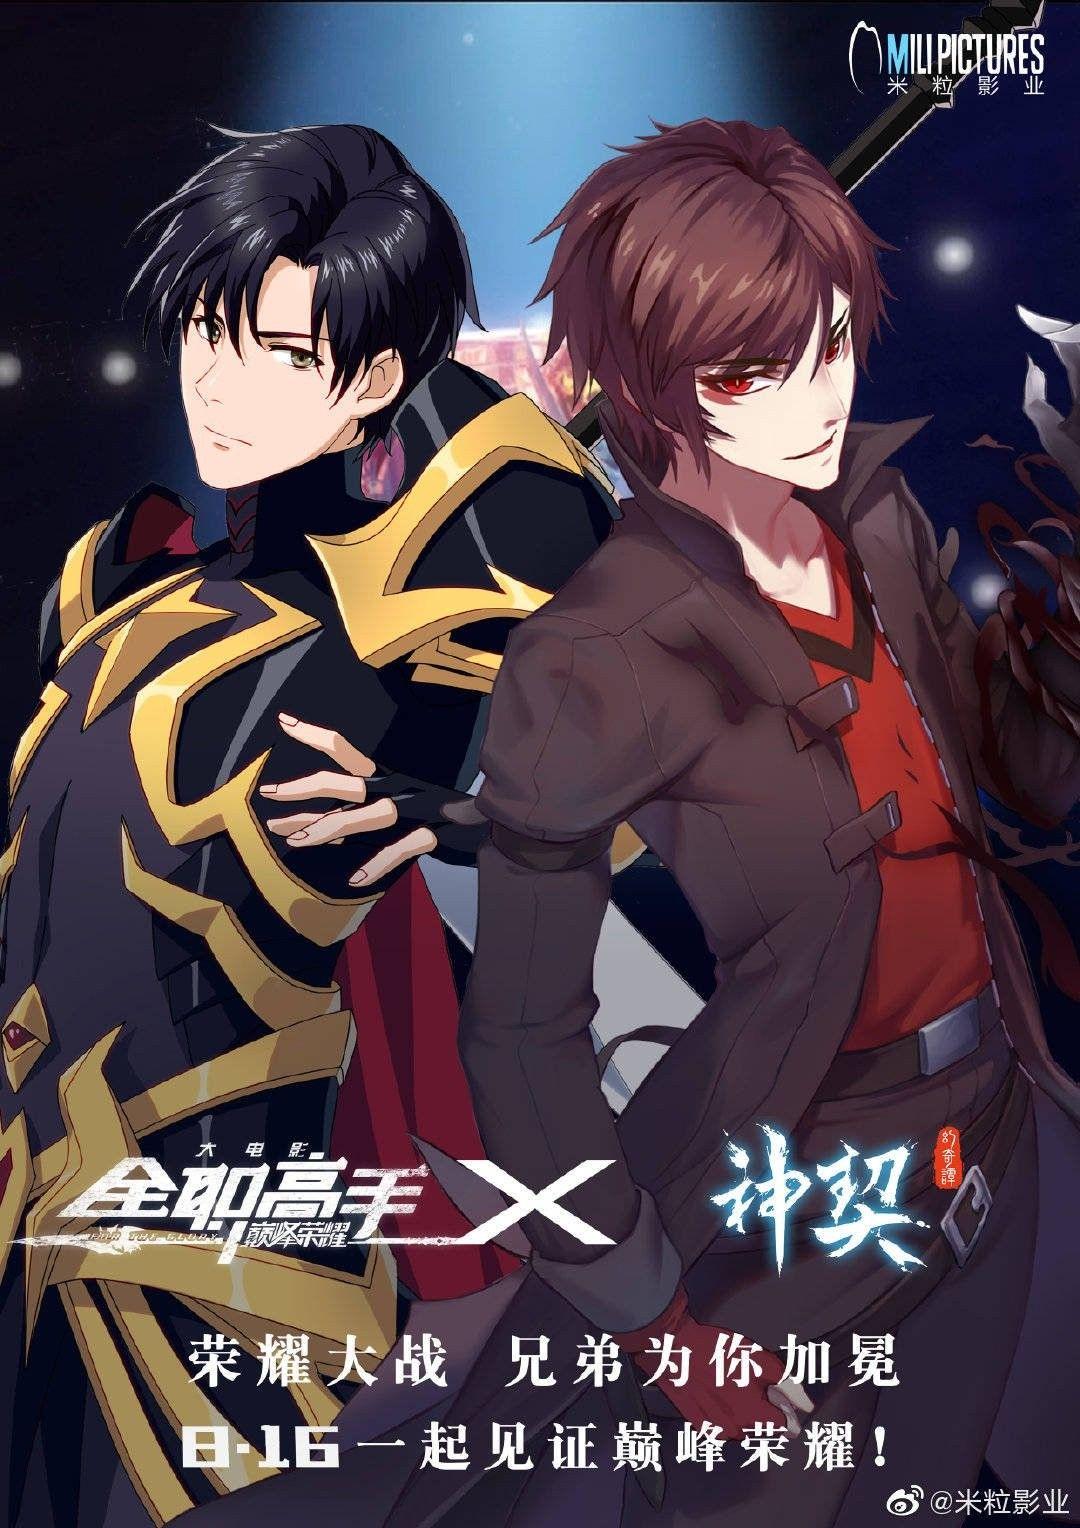 Pin by Yu Alexius on Chinese Anime Anime, Avatar, Art